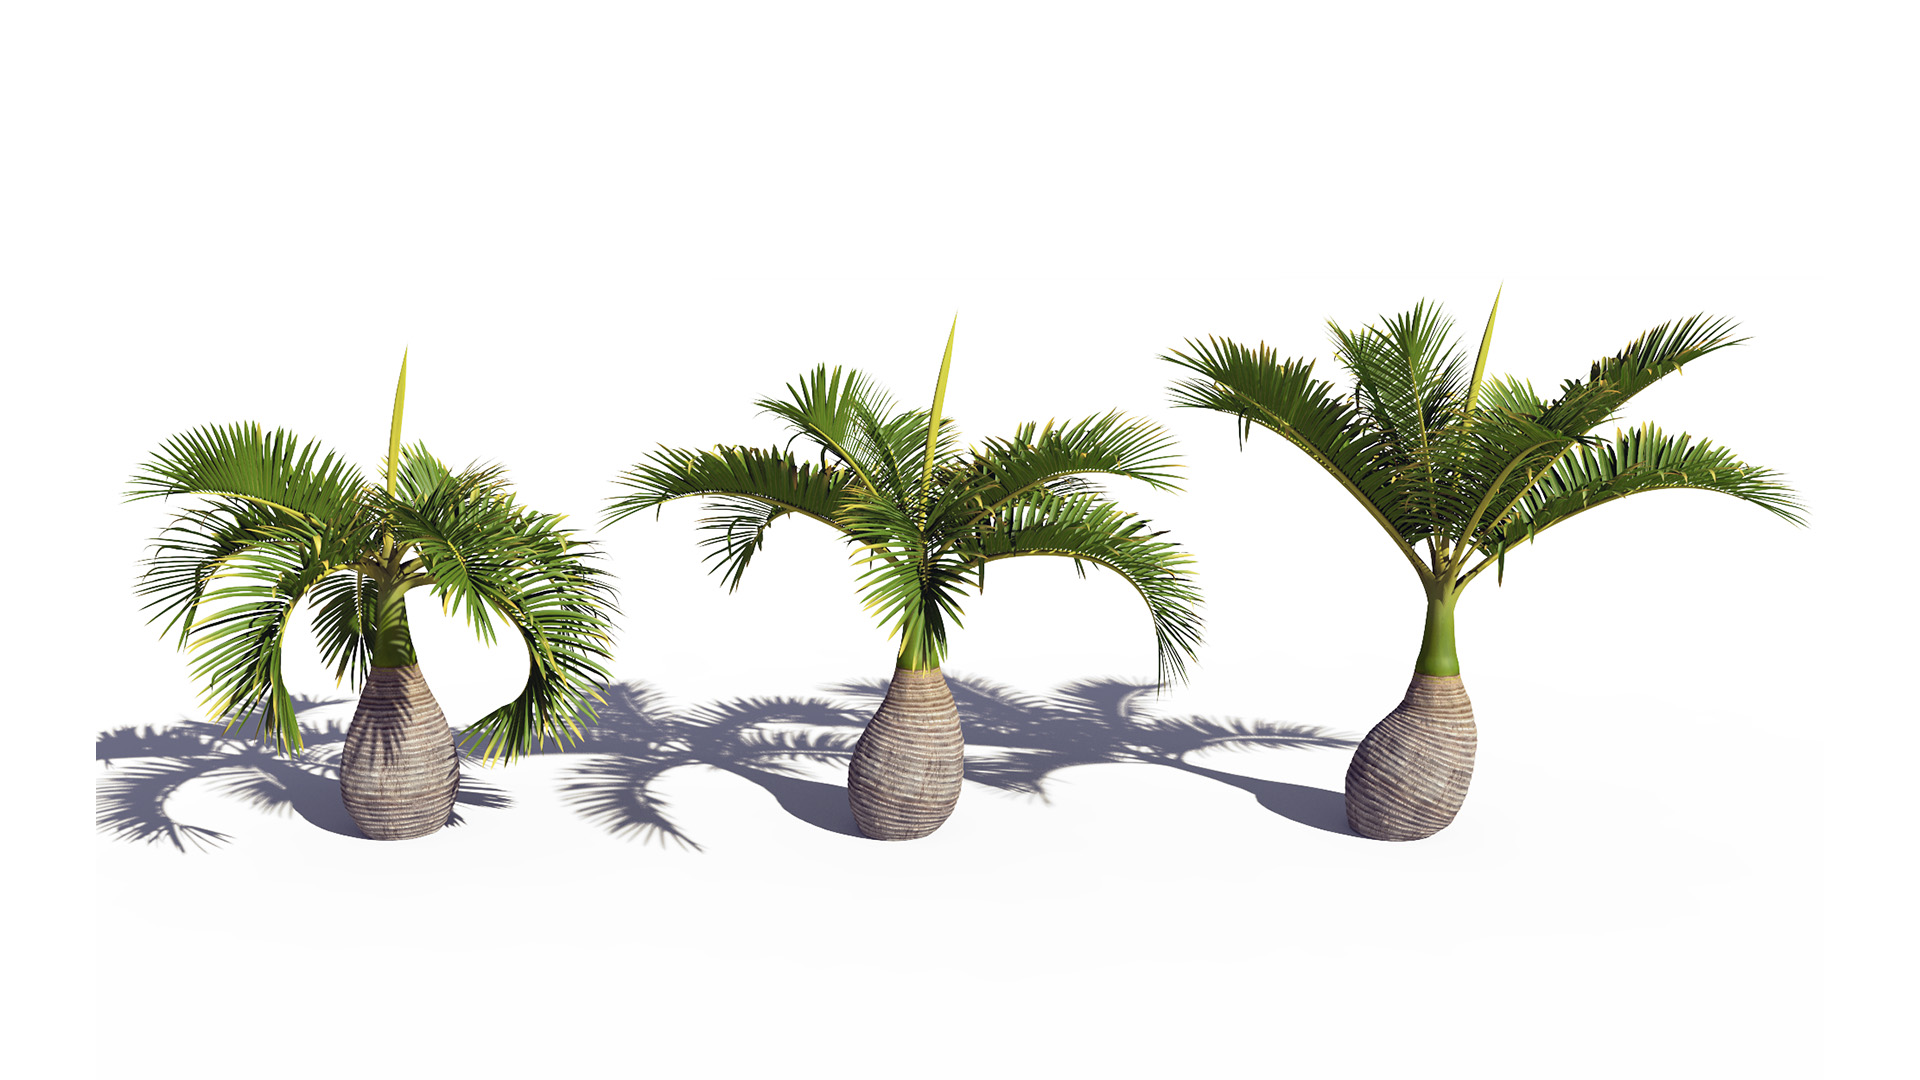 3D model of the Bottle palm Hyophorbe lagenicaulis